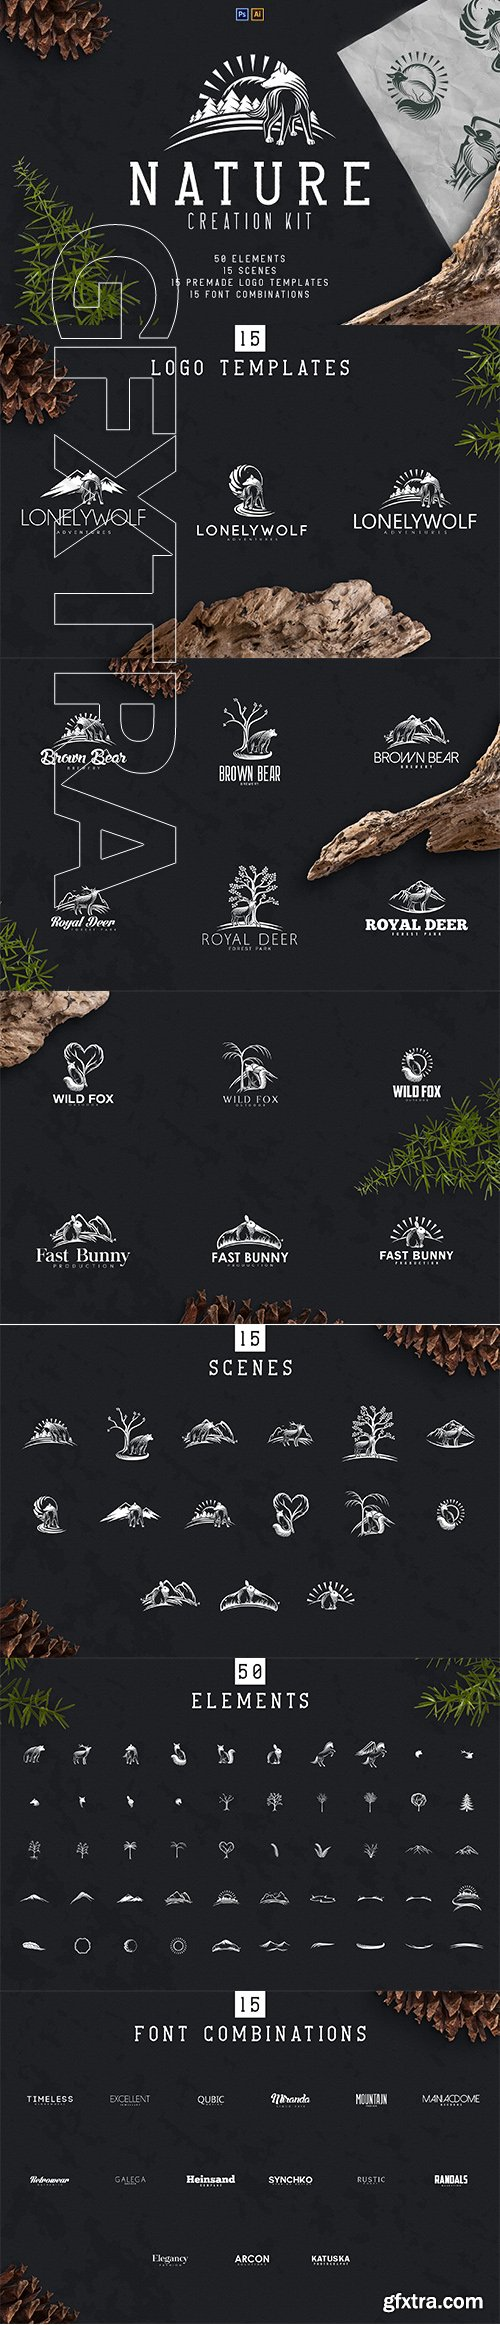 CreativeMarket - Nature Creation Kit 3370721